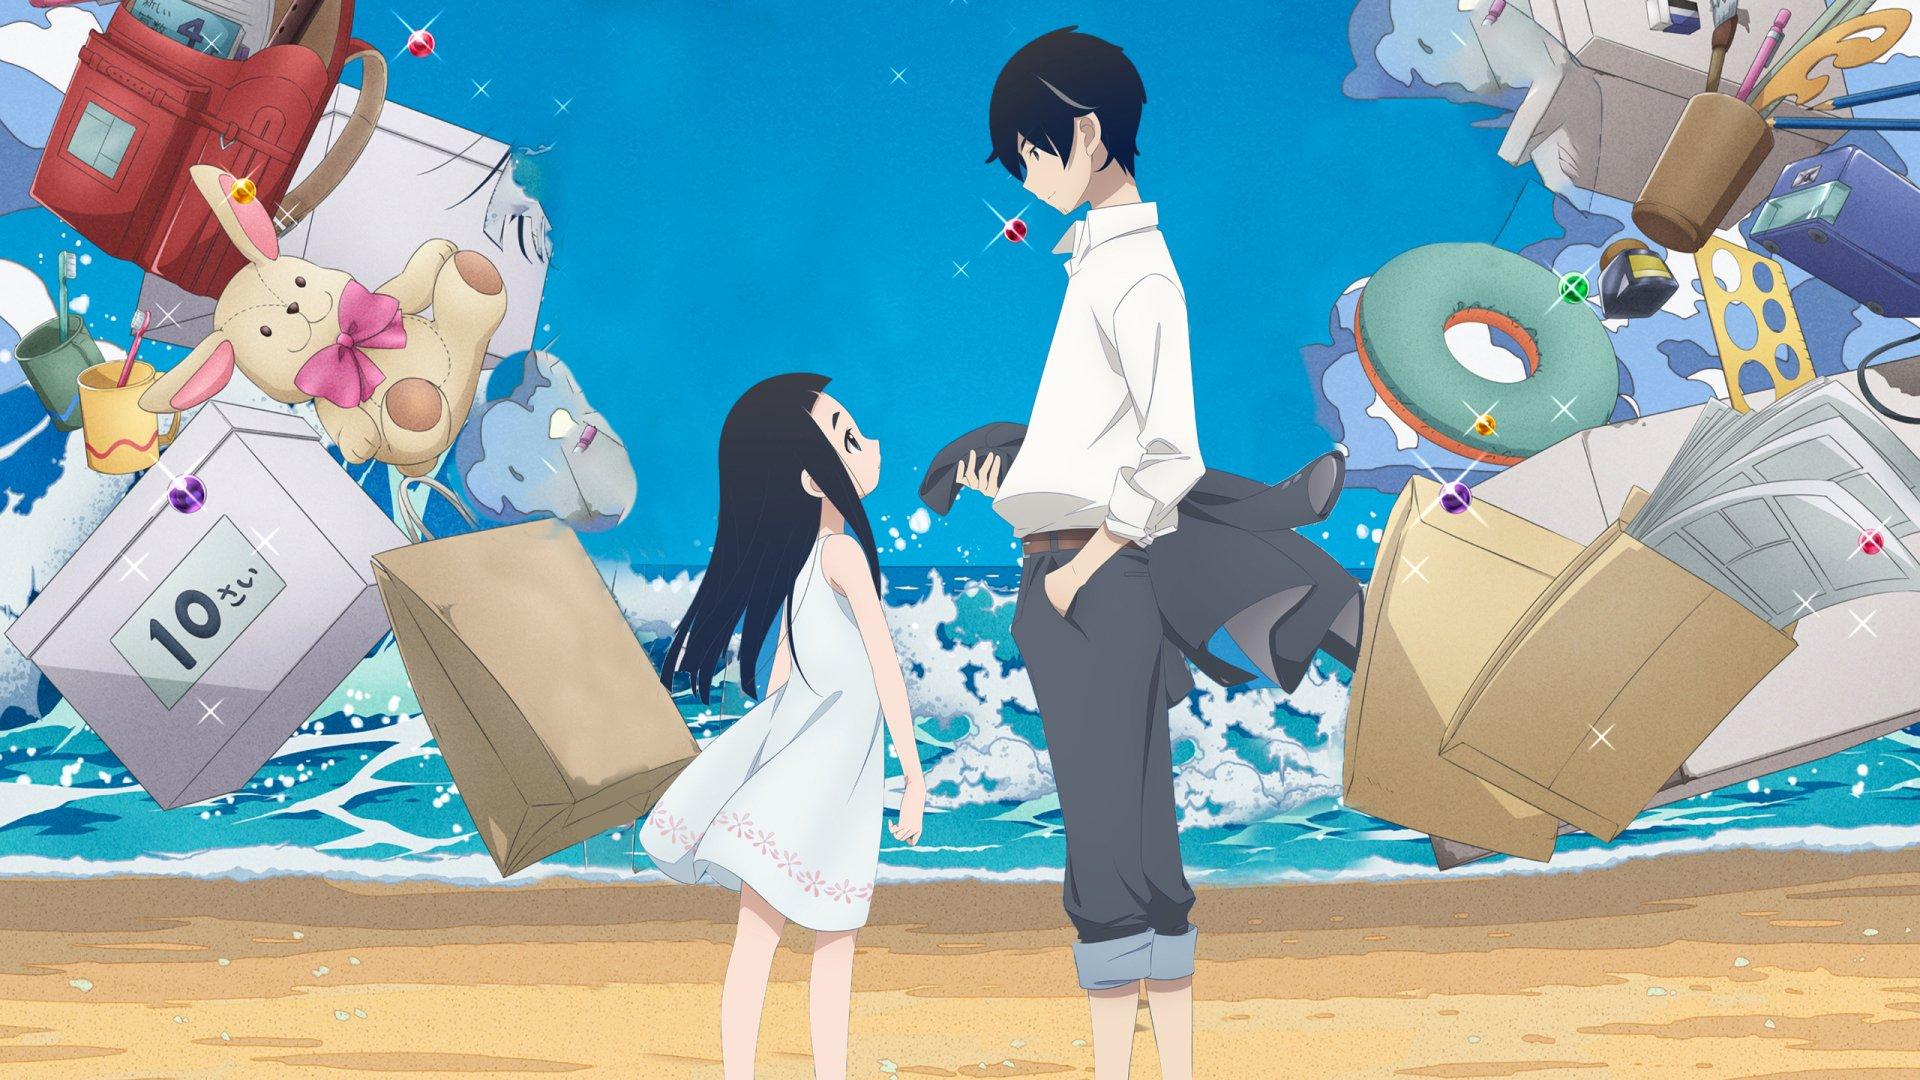 Filme compilatório 'Kakushigoto Theatrical Edition' chega este mês na Funimation